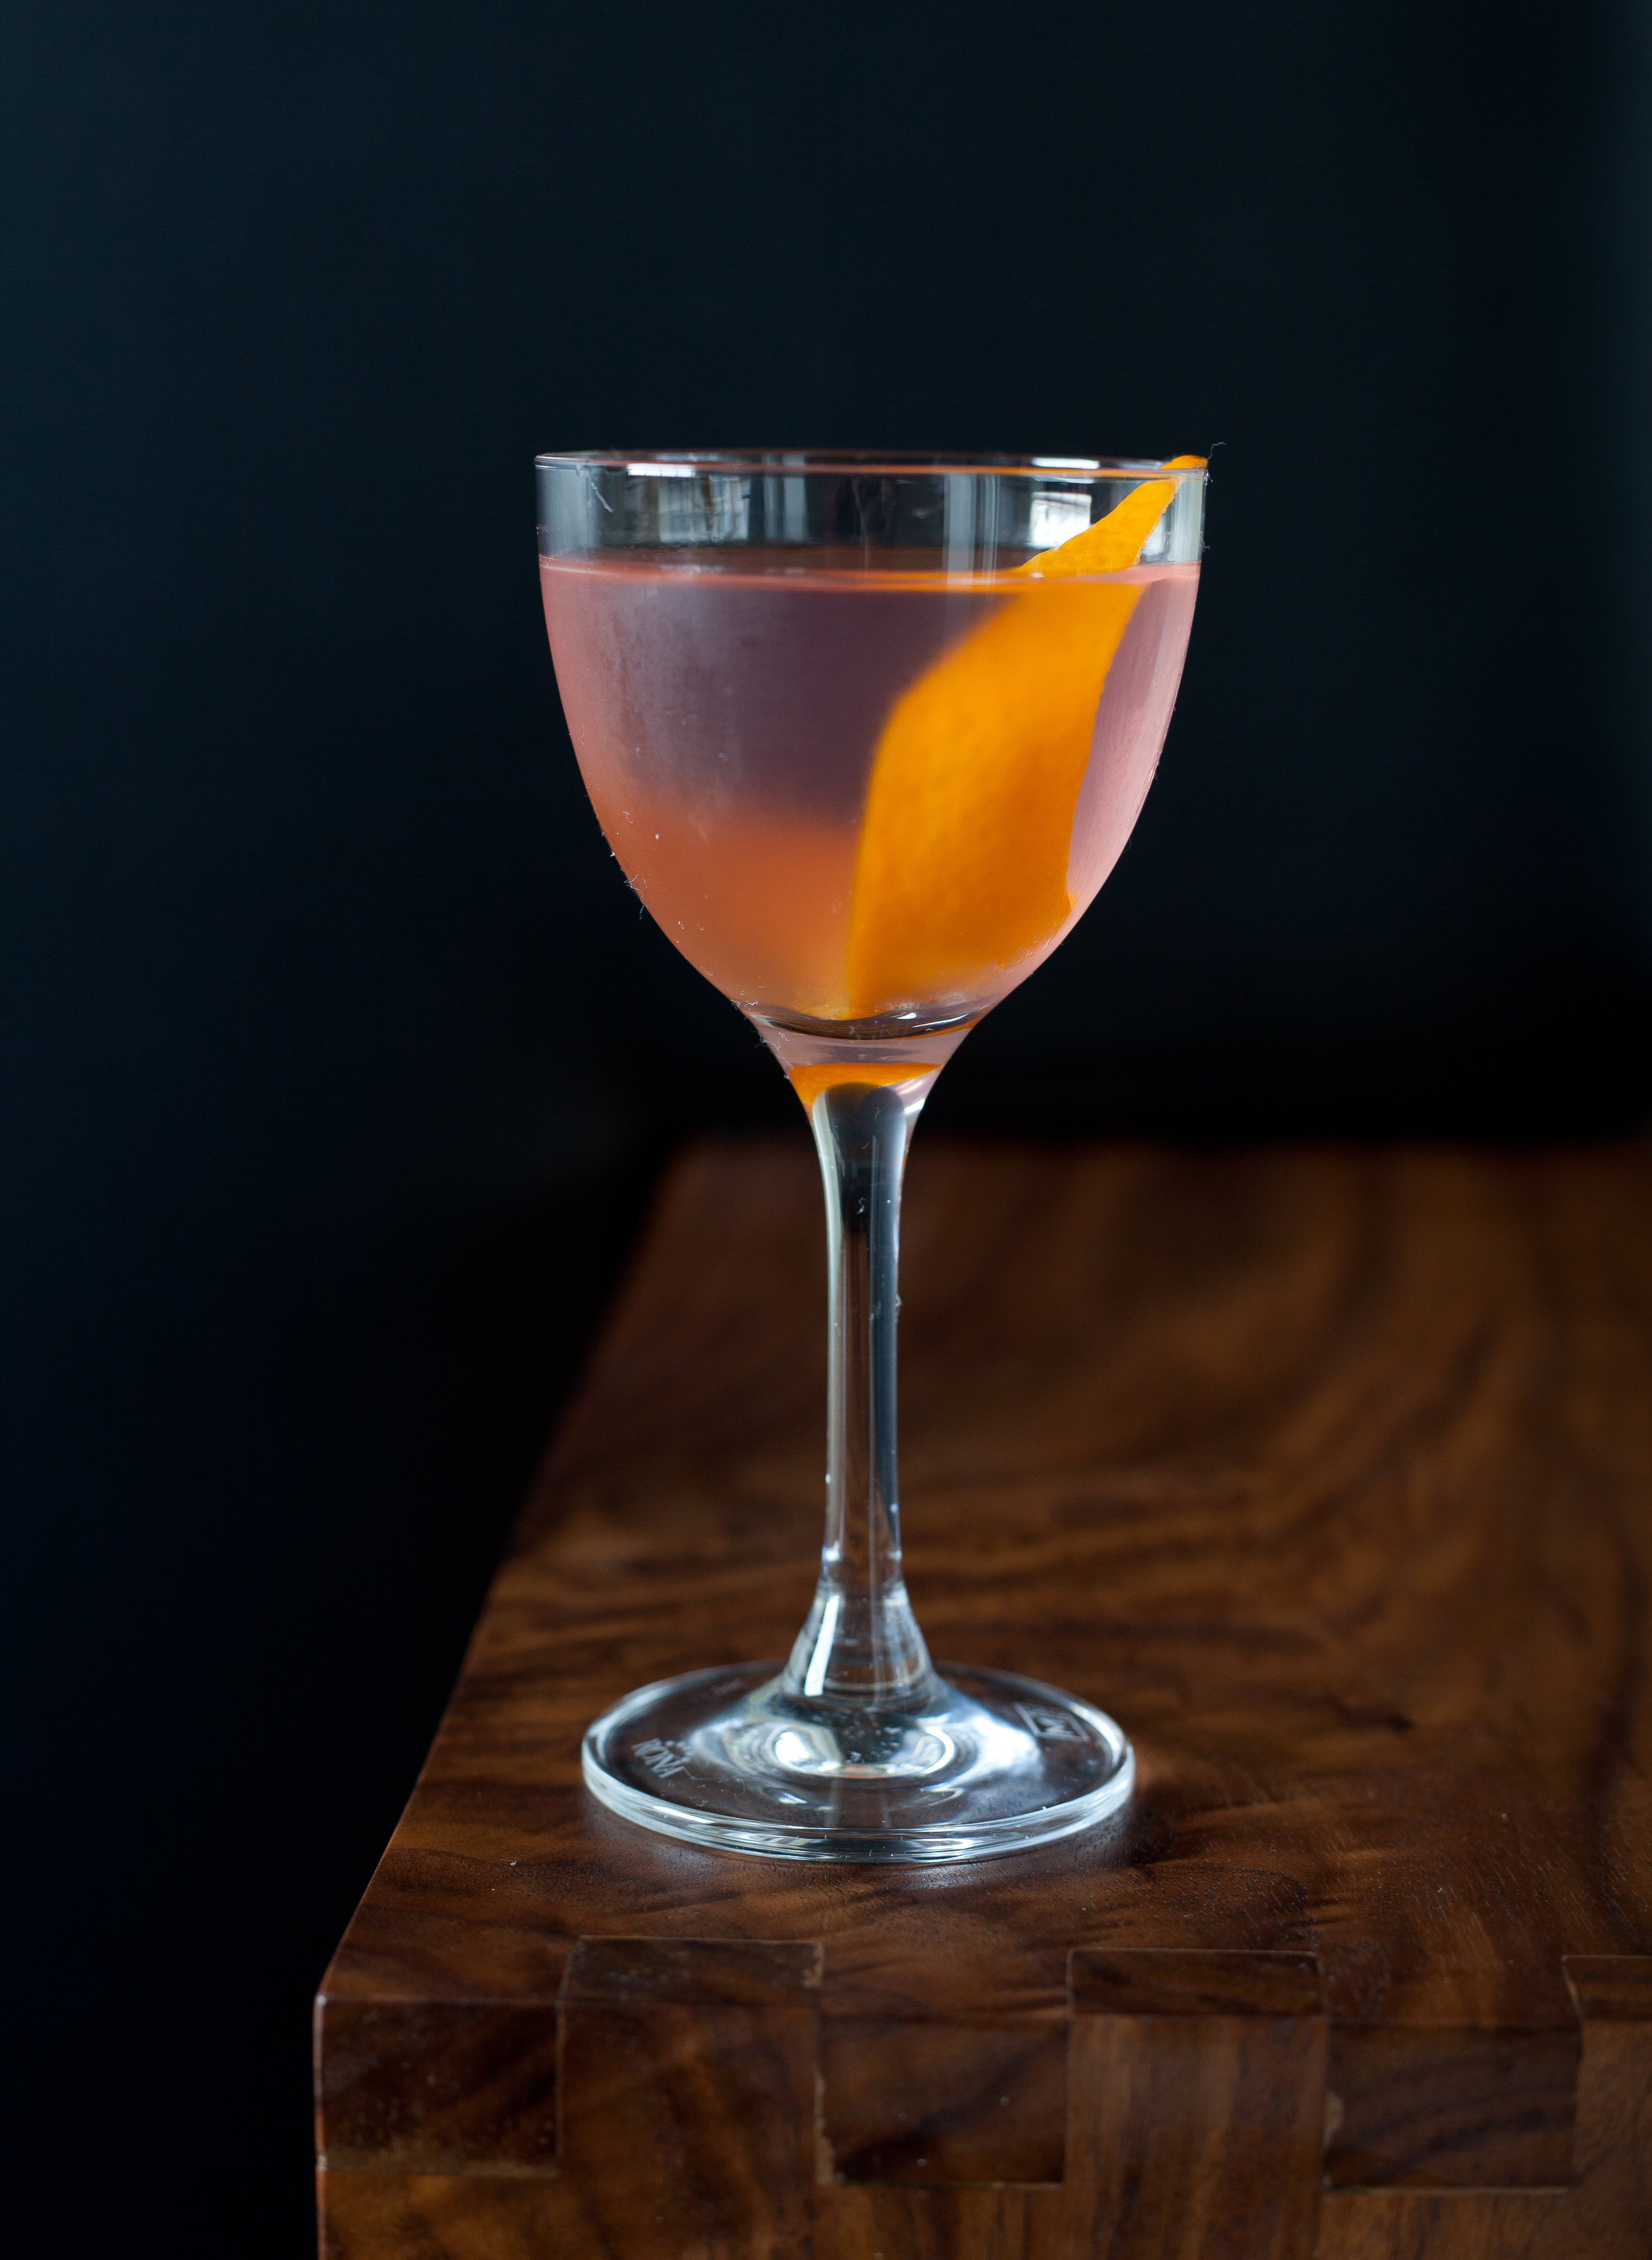 shf-2014-drinks-1737.jpg